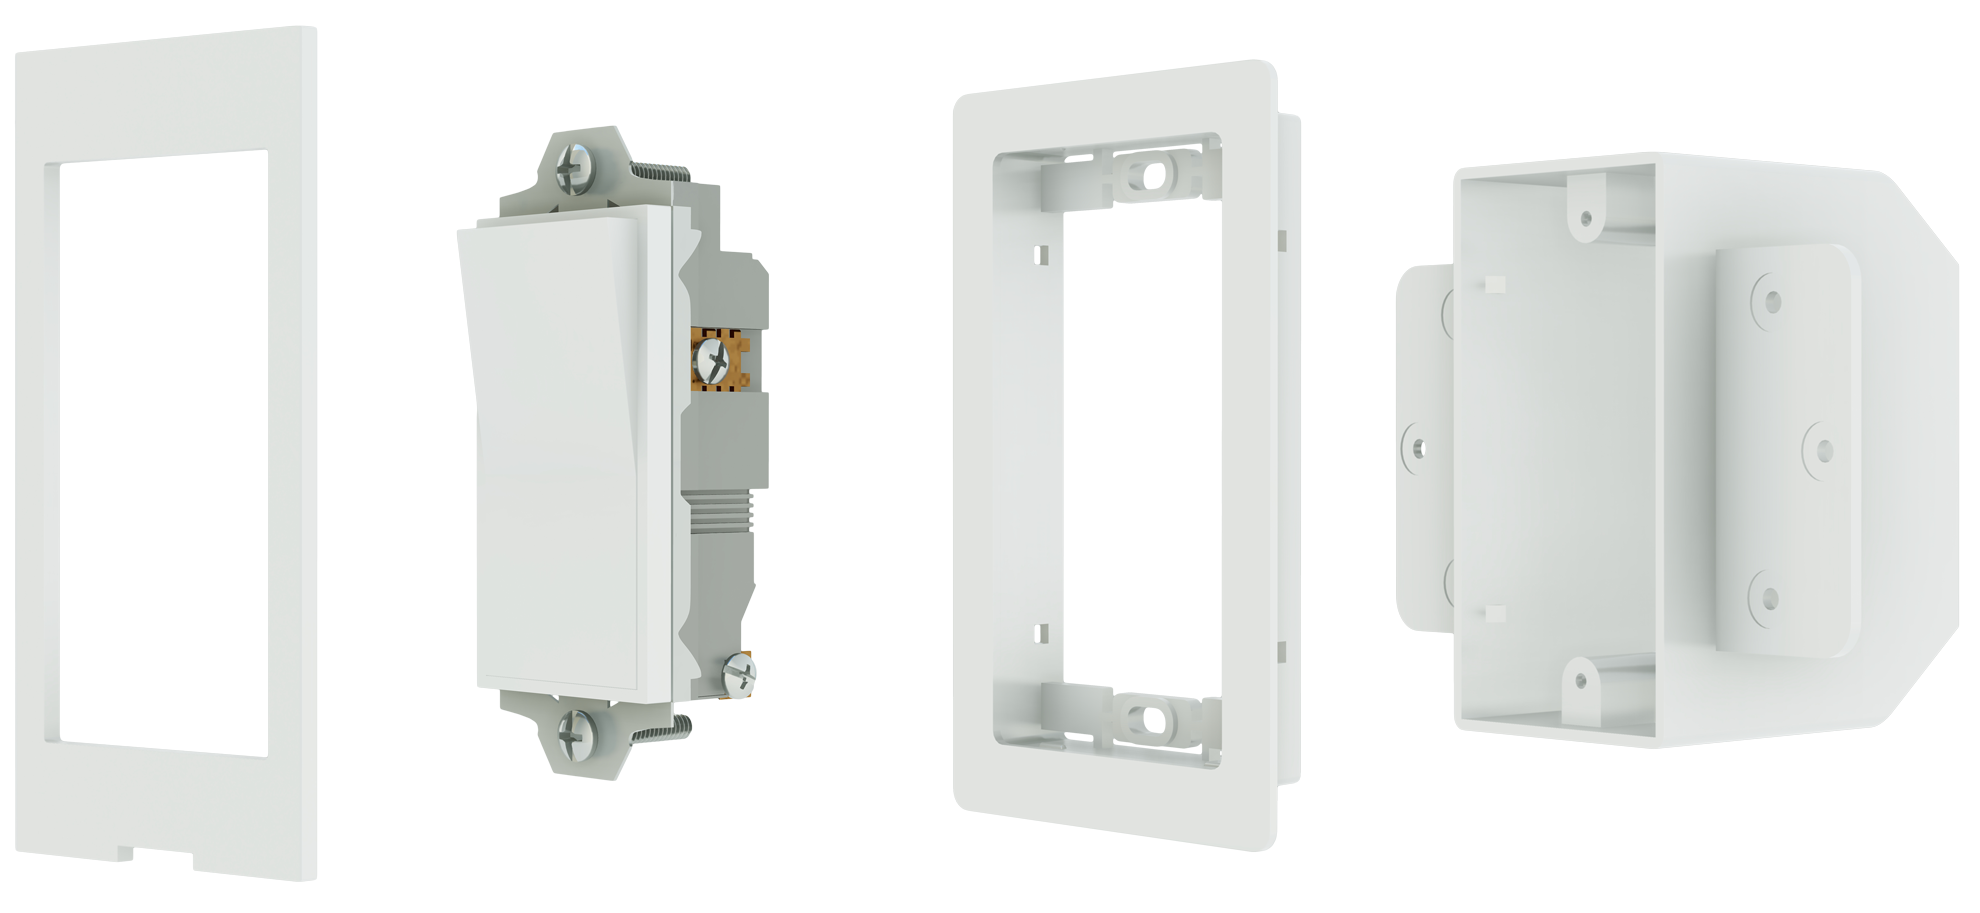 Flush Mount Light Switch